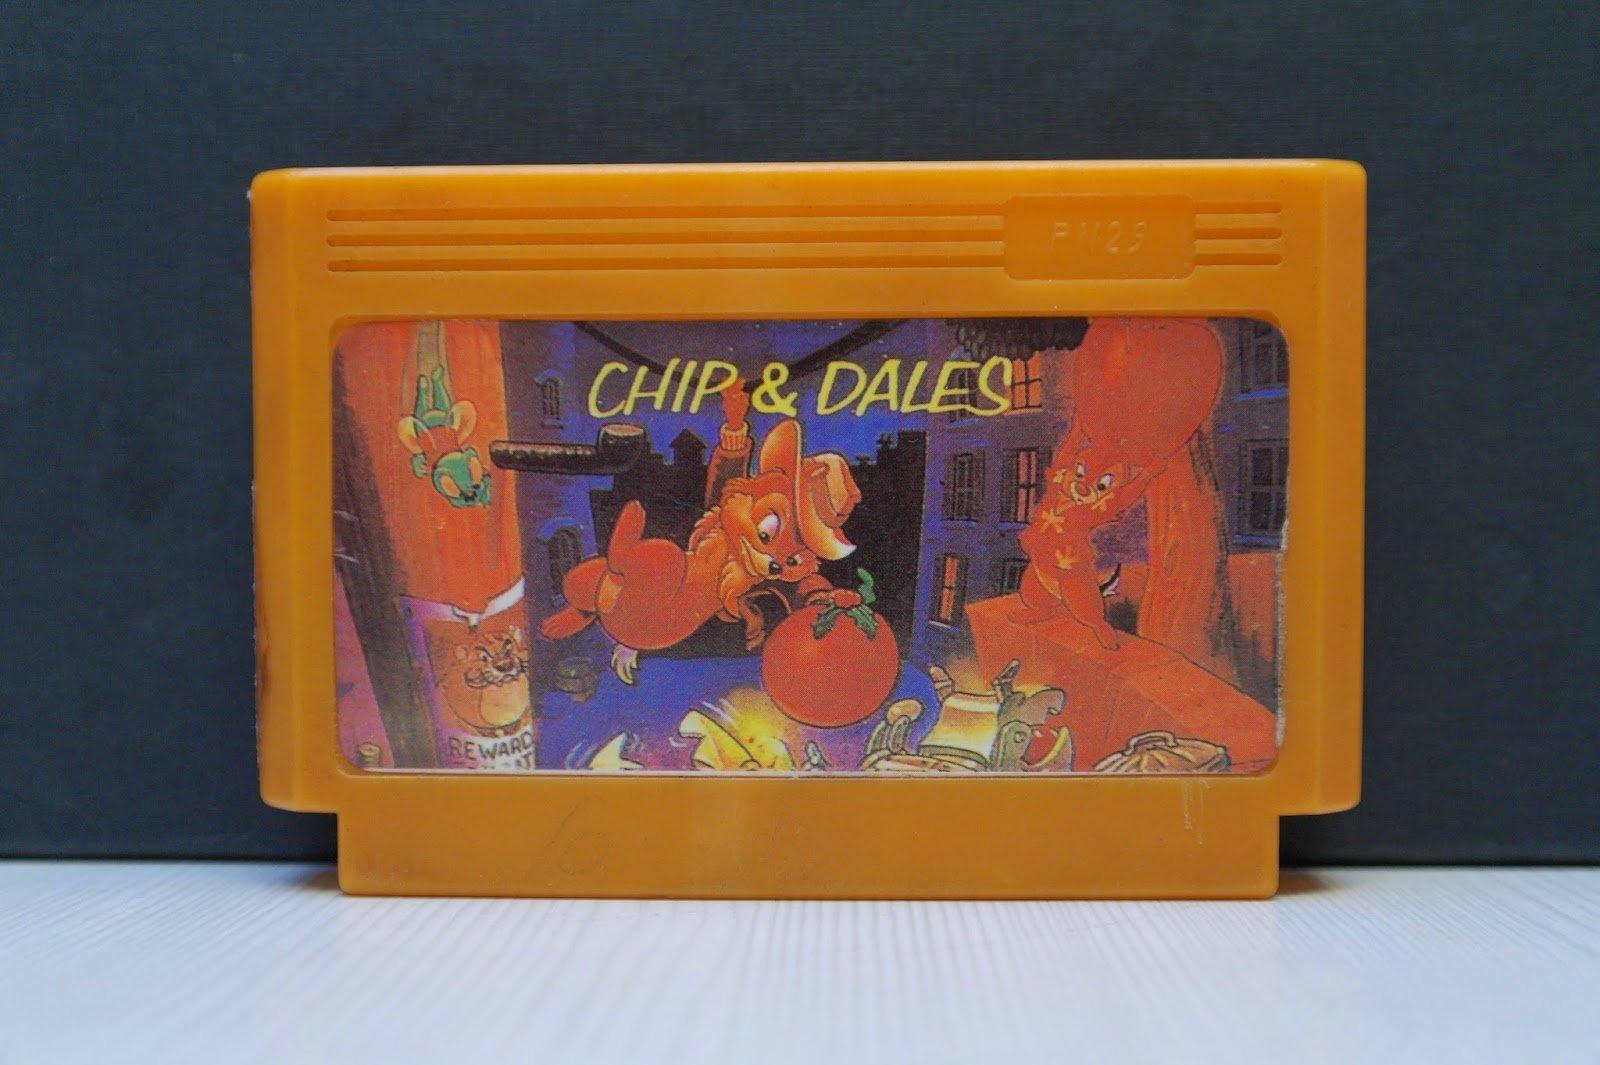 Chip and Dale к вам спешит. Ретро обзор от Evgenii.bad - Изображение 4